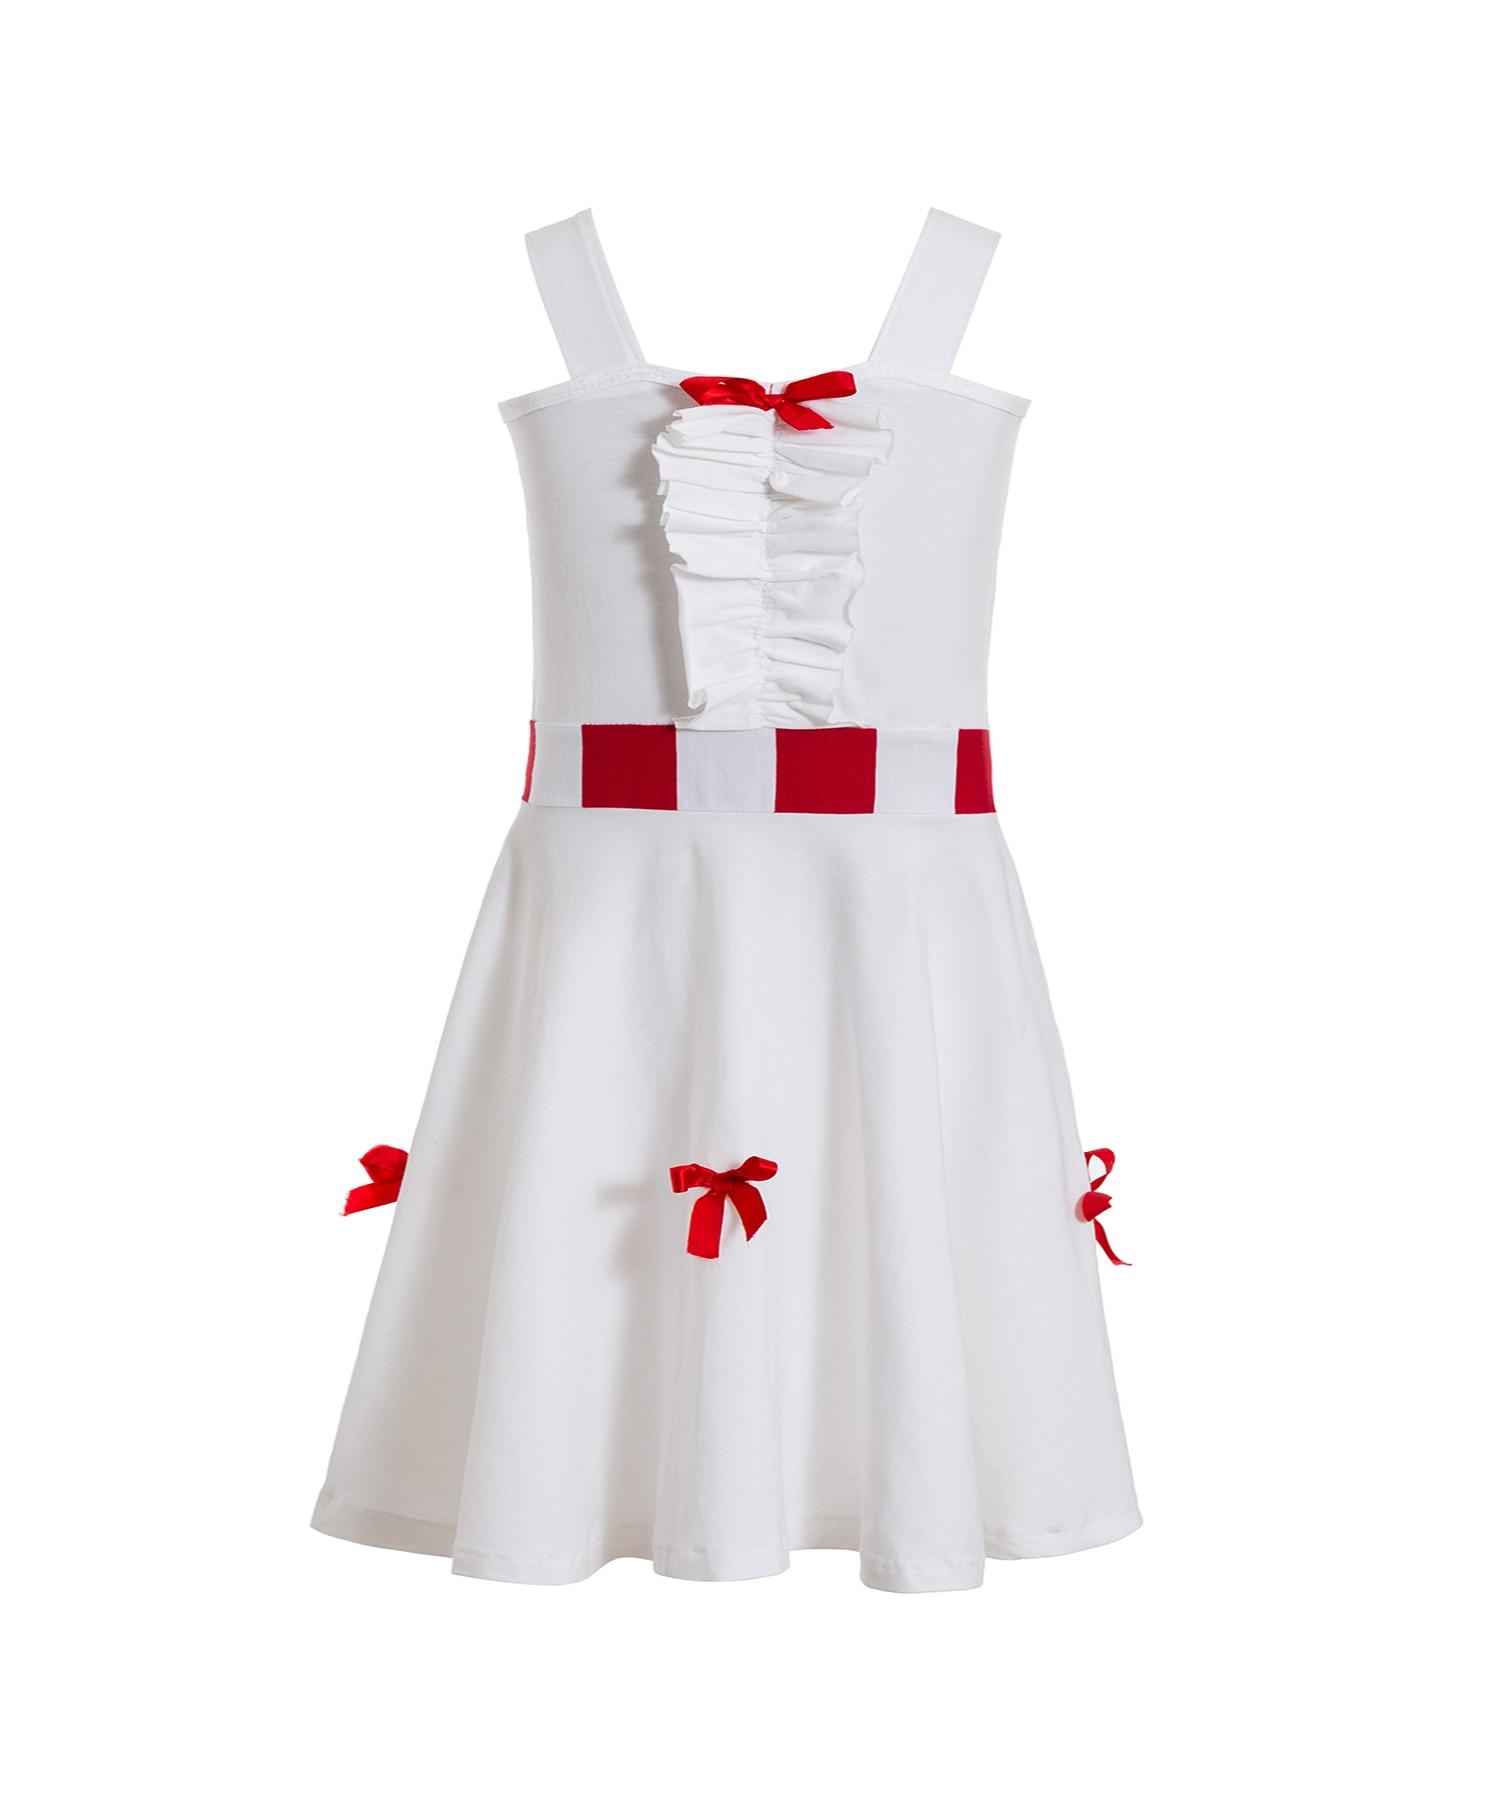 Disfraz de Mary Poppins para niños Mary Poppins princesa Cosplay inglés niñera vestido de Mary Poppins Jolly Holiday traje